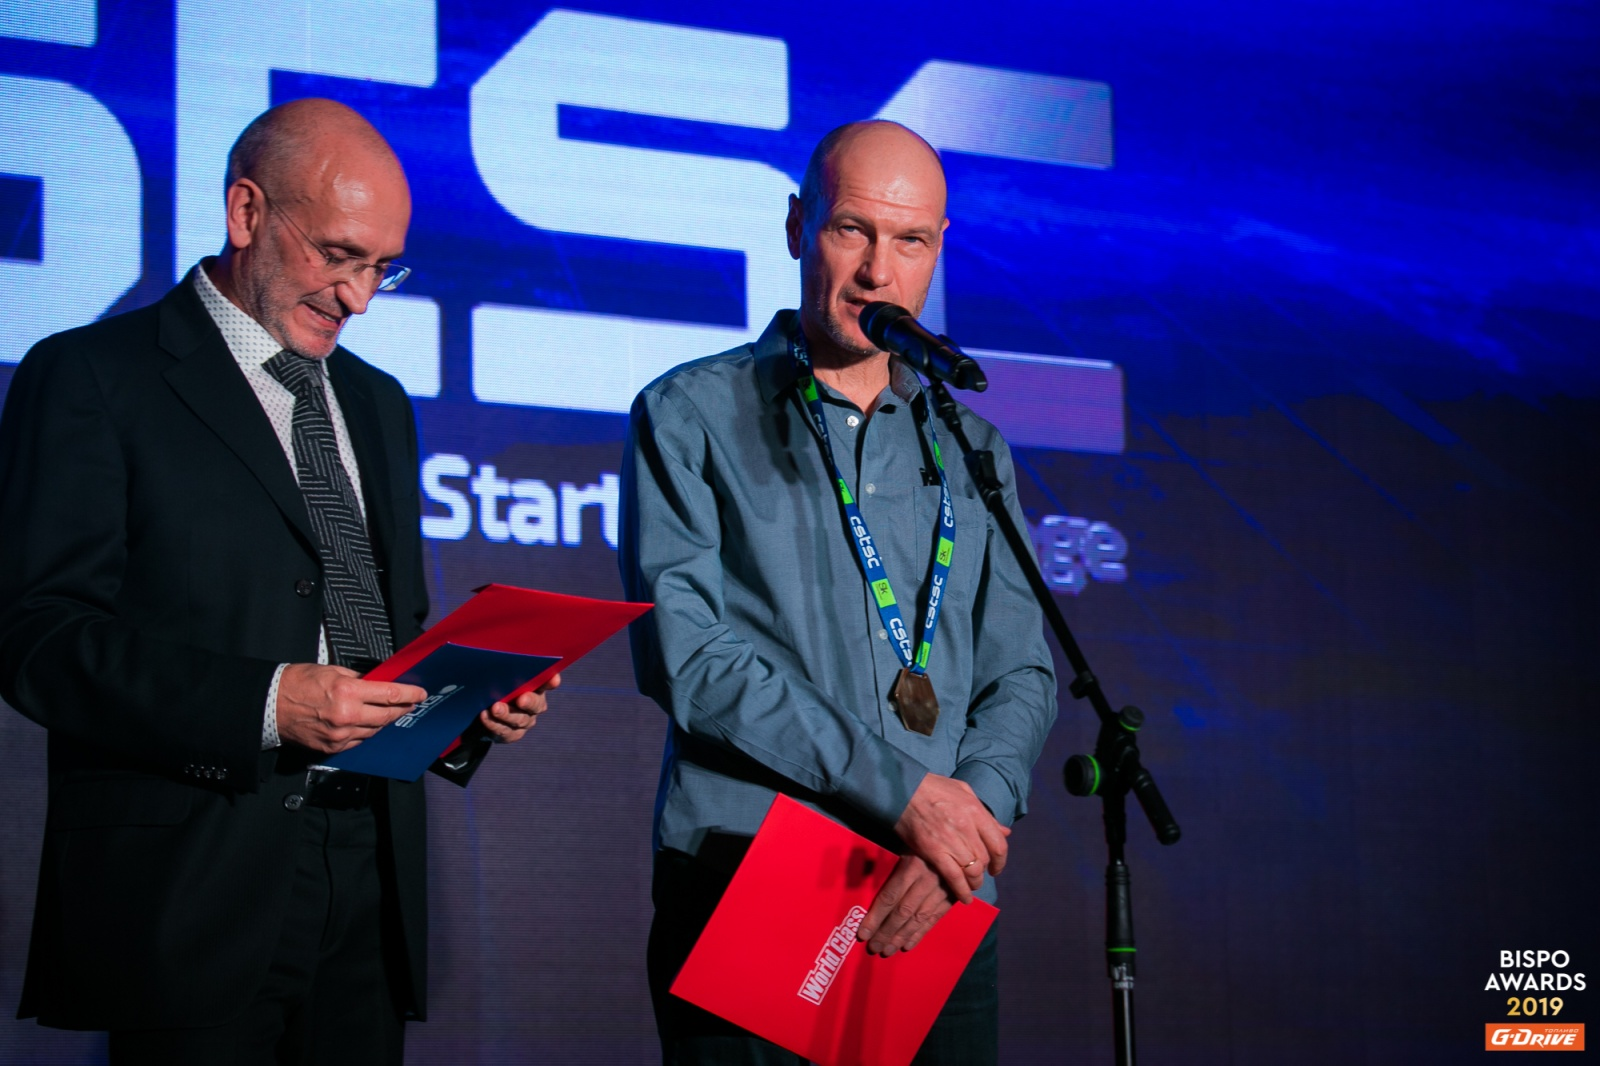 15 наград для спортивно-технологических стартапов на CSTSC от Sports tech innovation group - 5